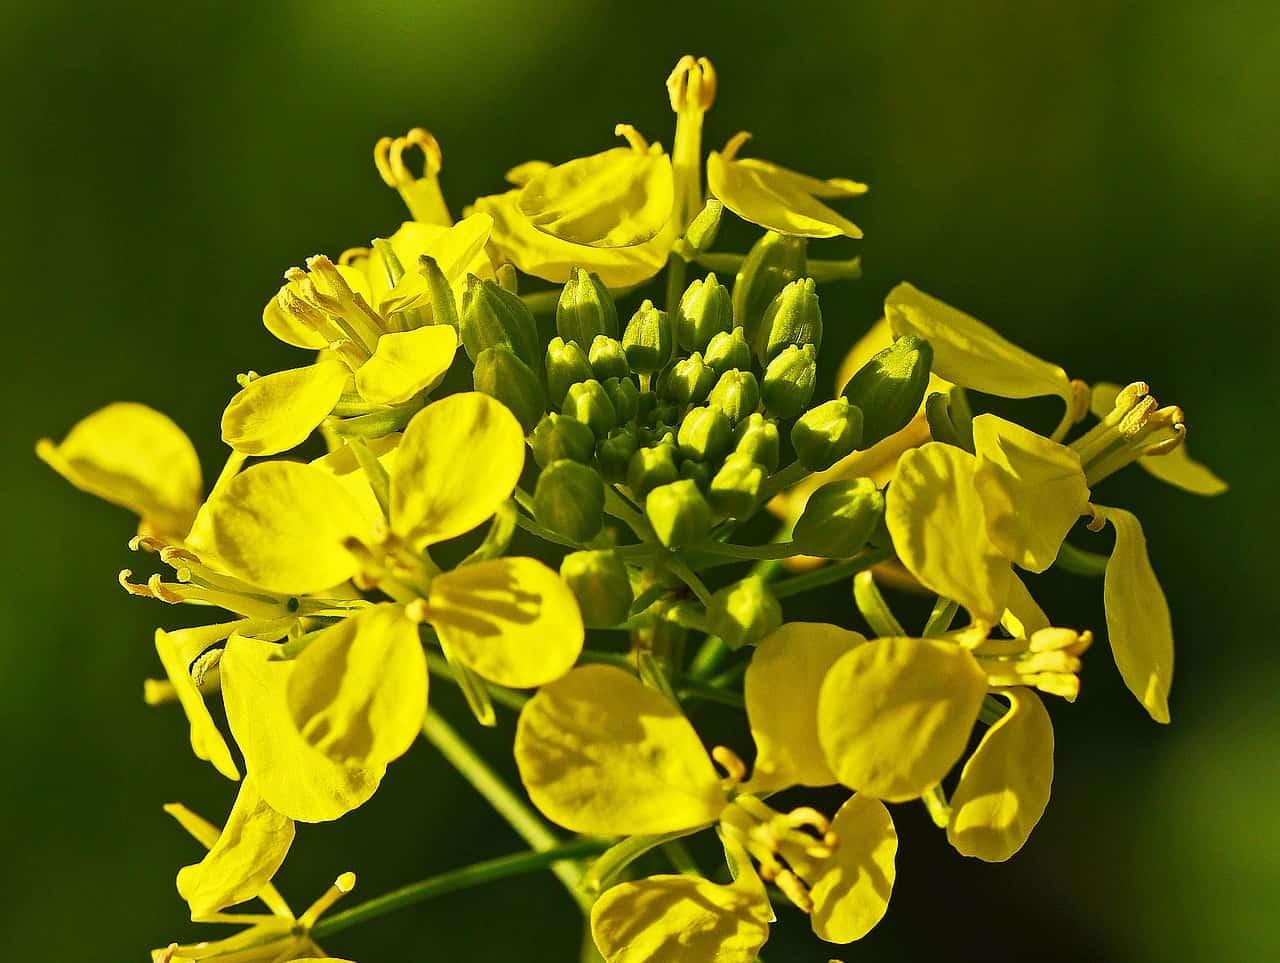 Mustard flower.